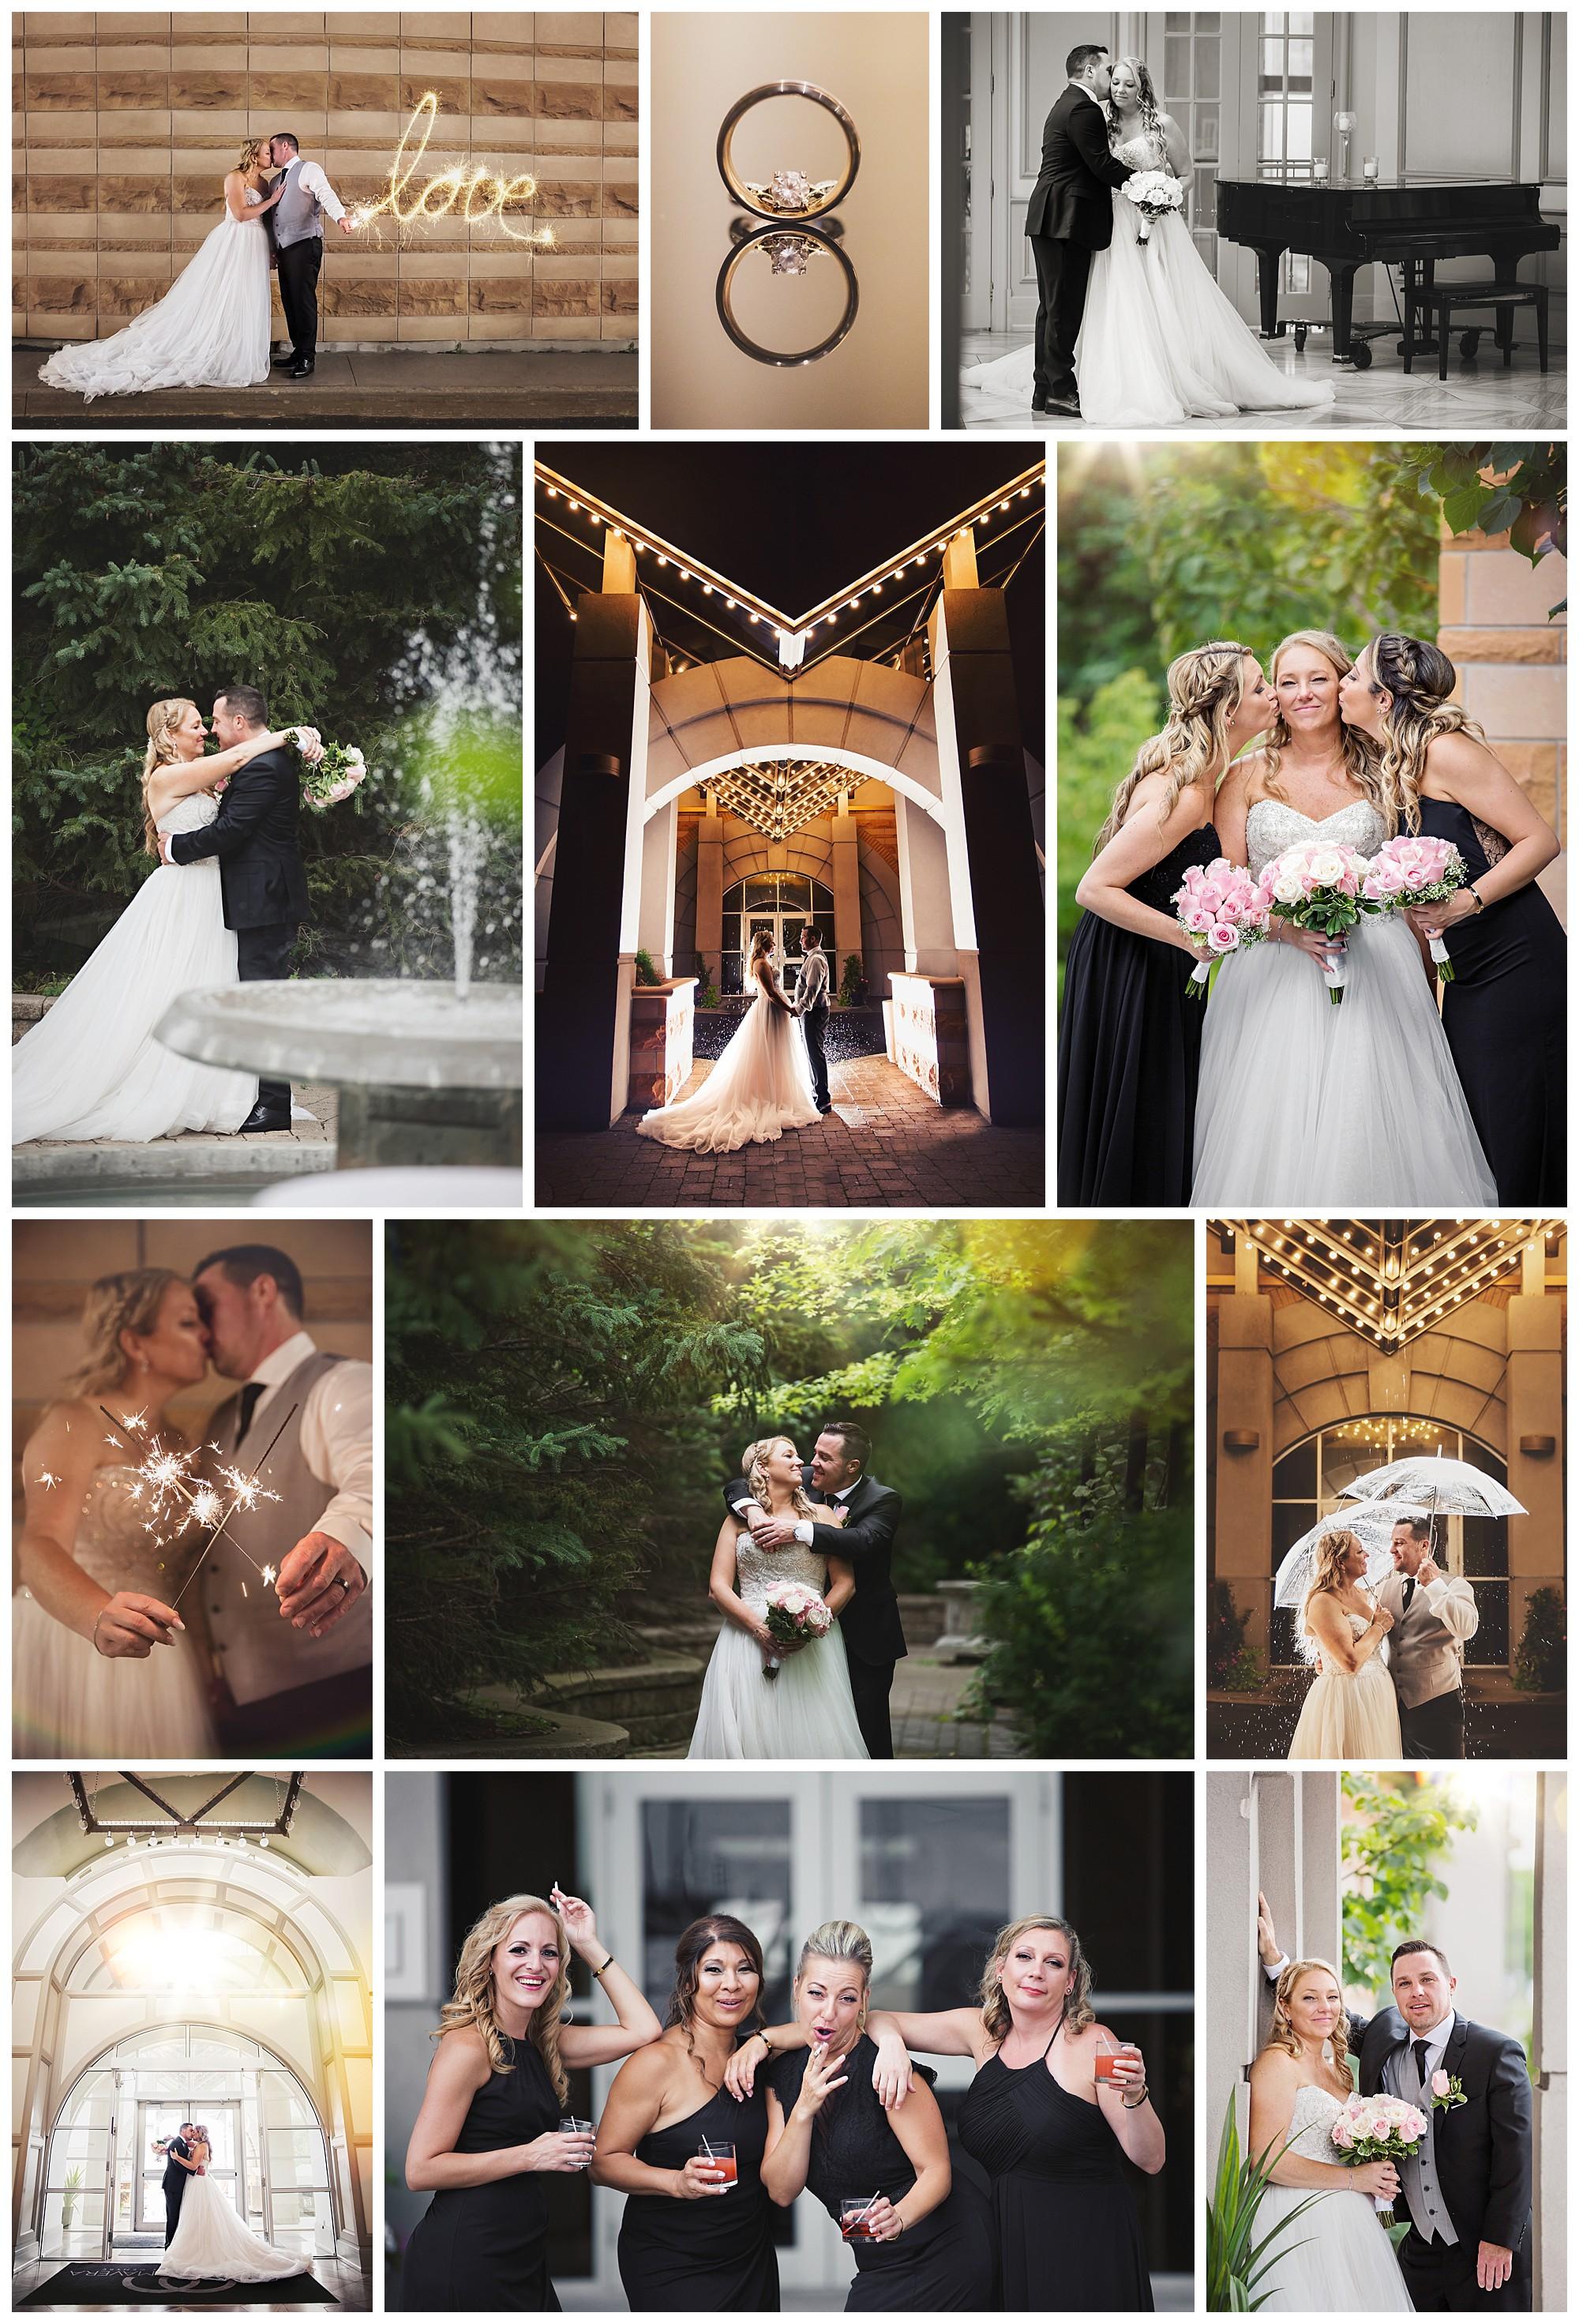 La Fontana Primavera, Vaughan, Ontario wedding photos by VanDaele & Russell